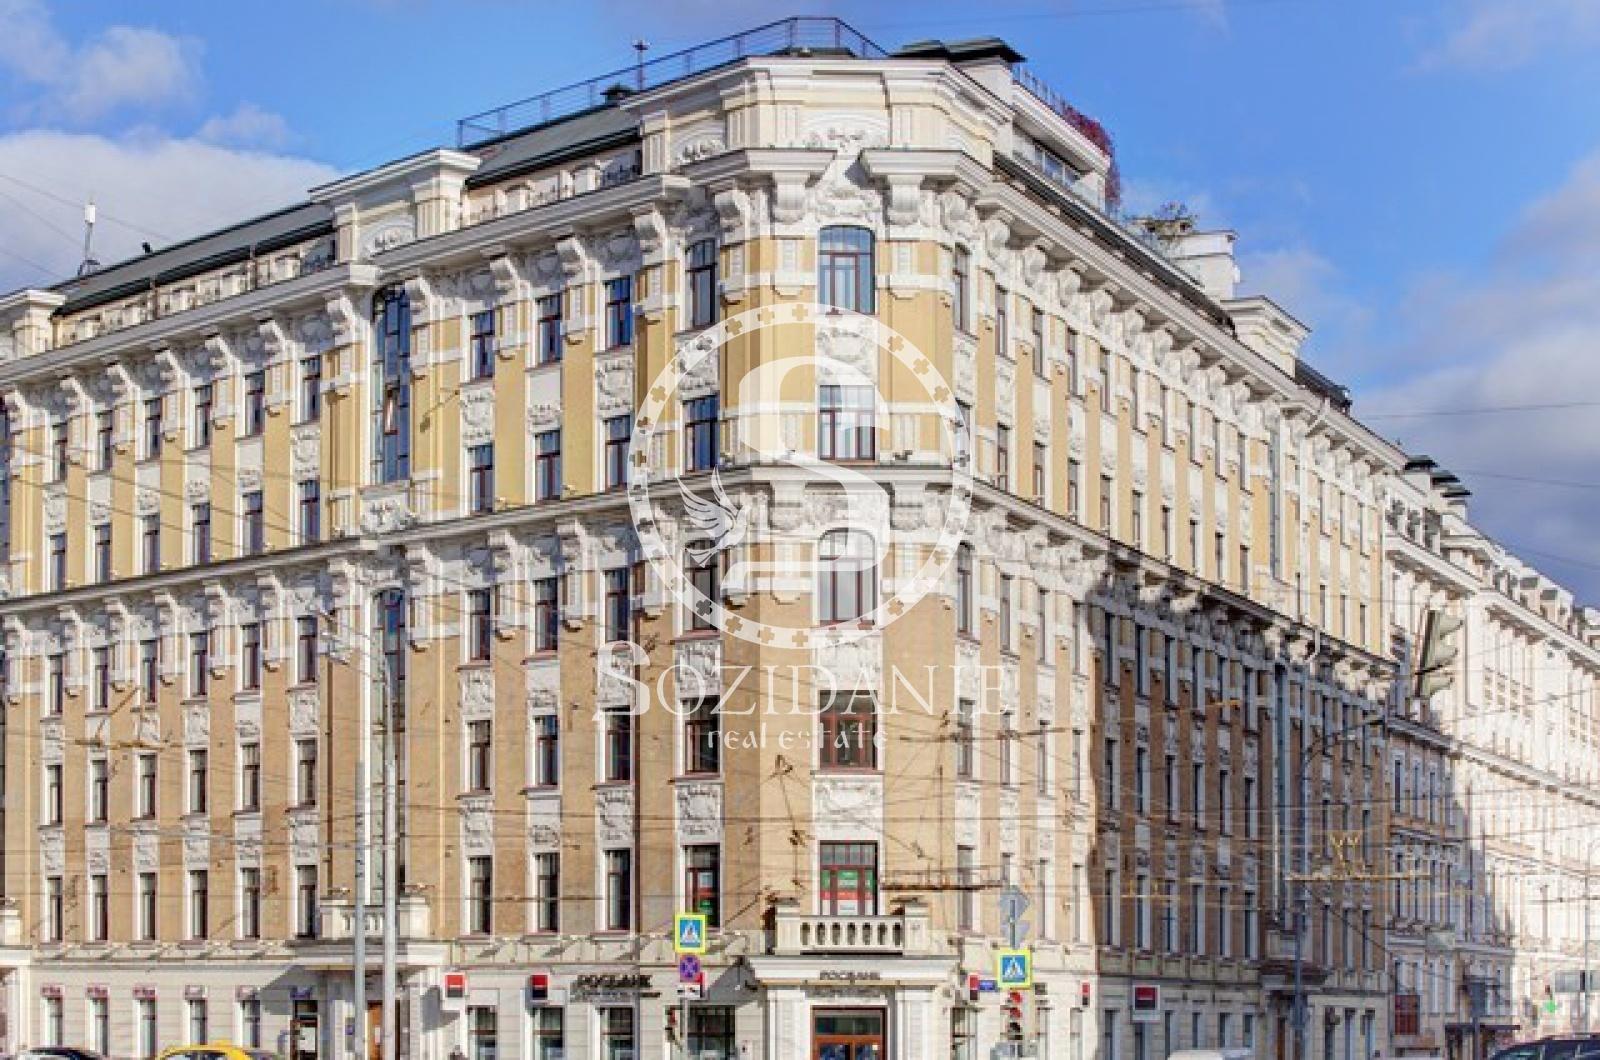 4 Комнаты, Городская, Продажа, Улица Пречистенка, Listing ID 3387, Москва, Россия,